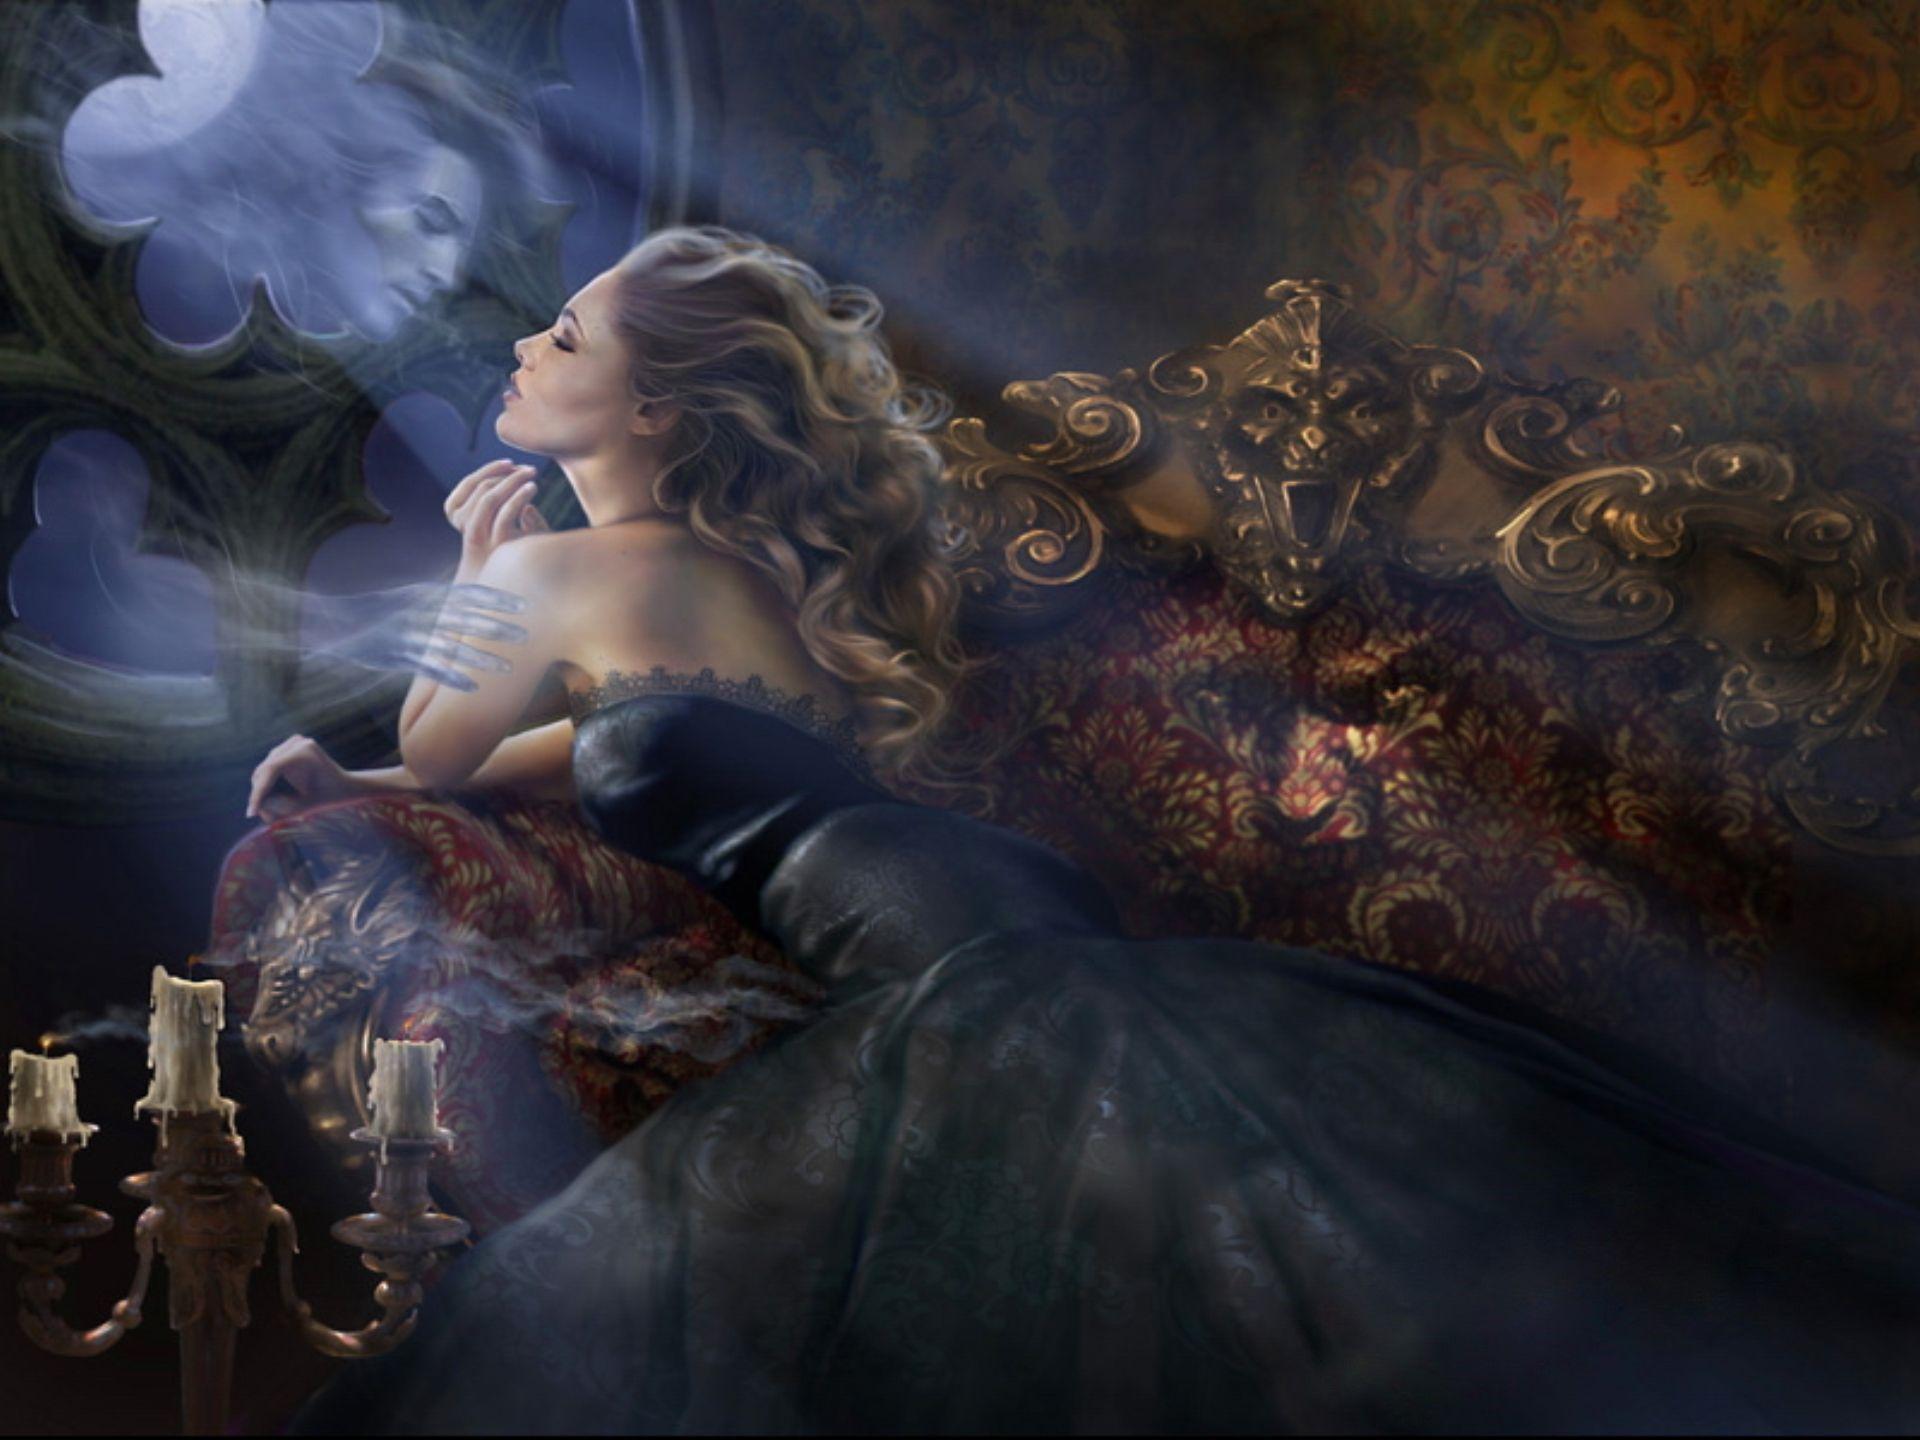 love romance ghost mirror sad sorrow women blondes art fantasy